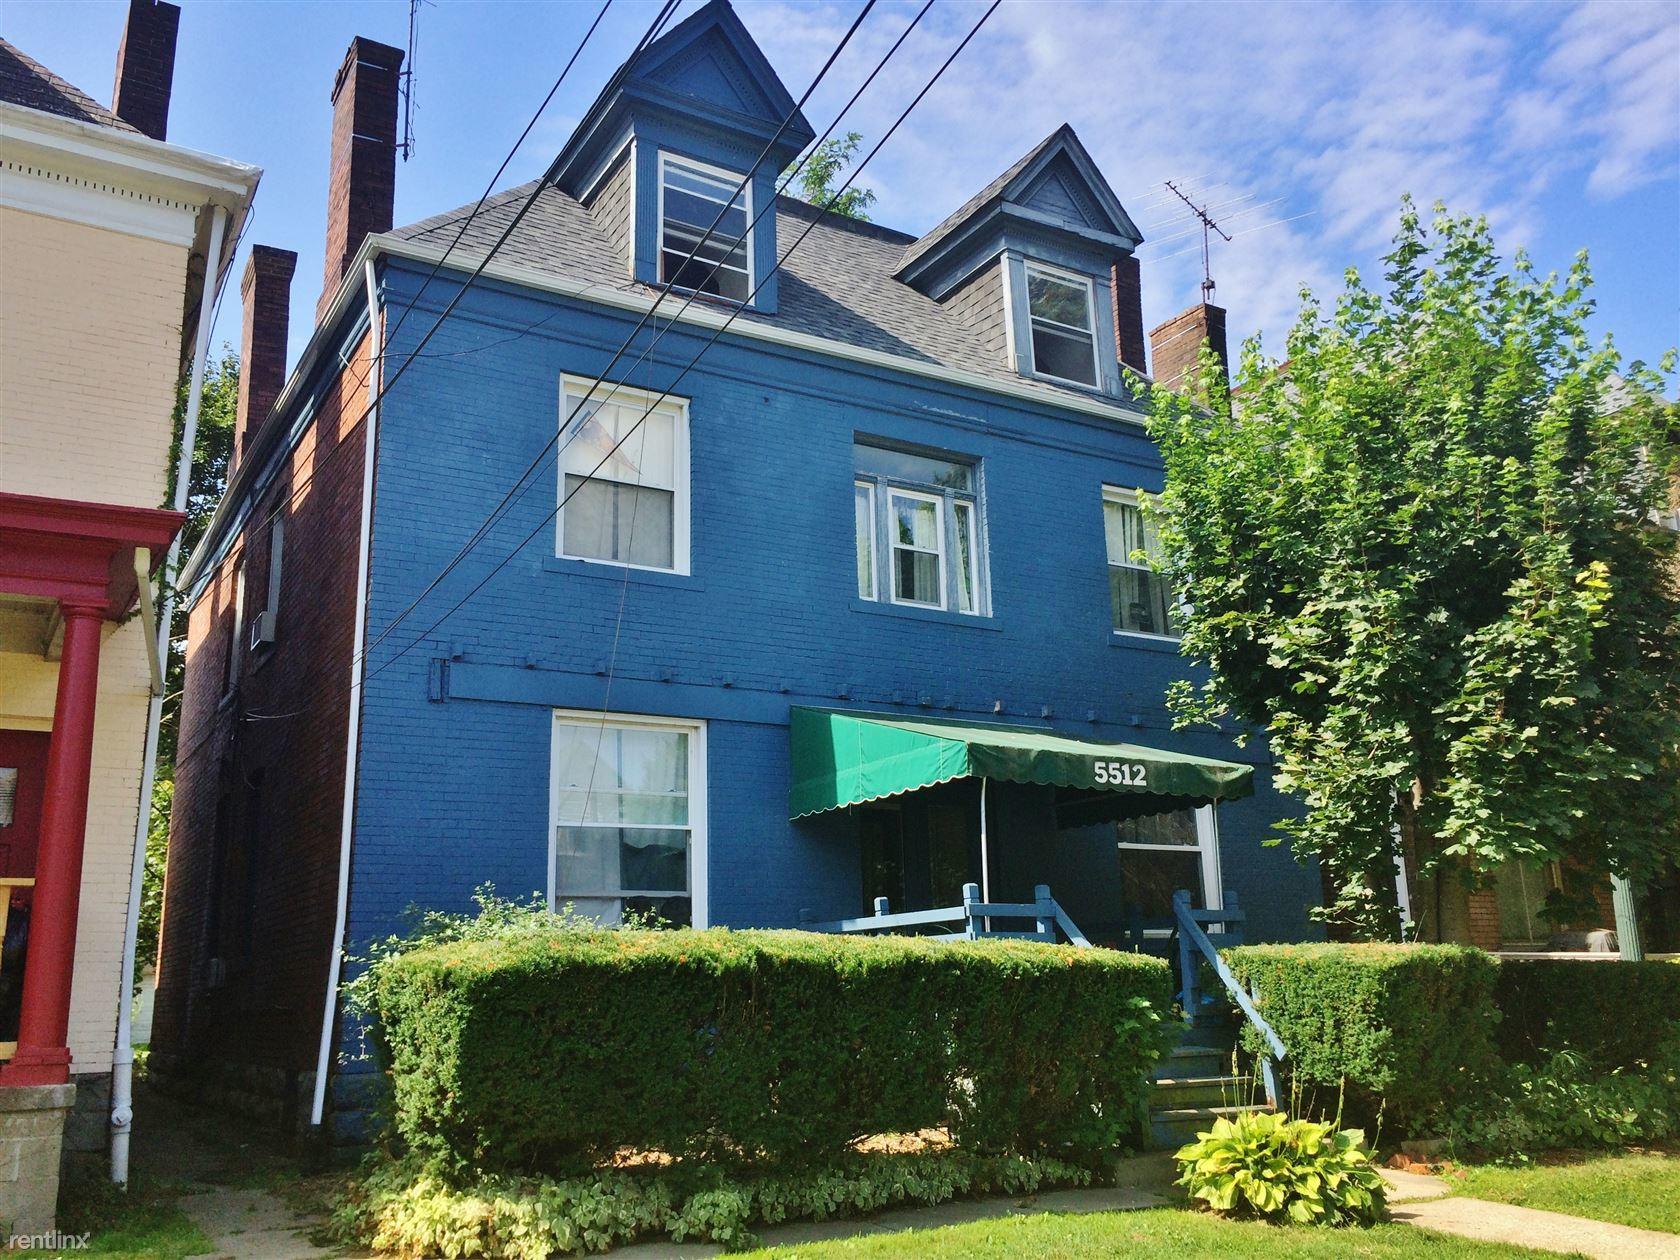 1 bed, 1.0 bath, $695 Rentals - Pittsburgh, PA | Trulia